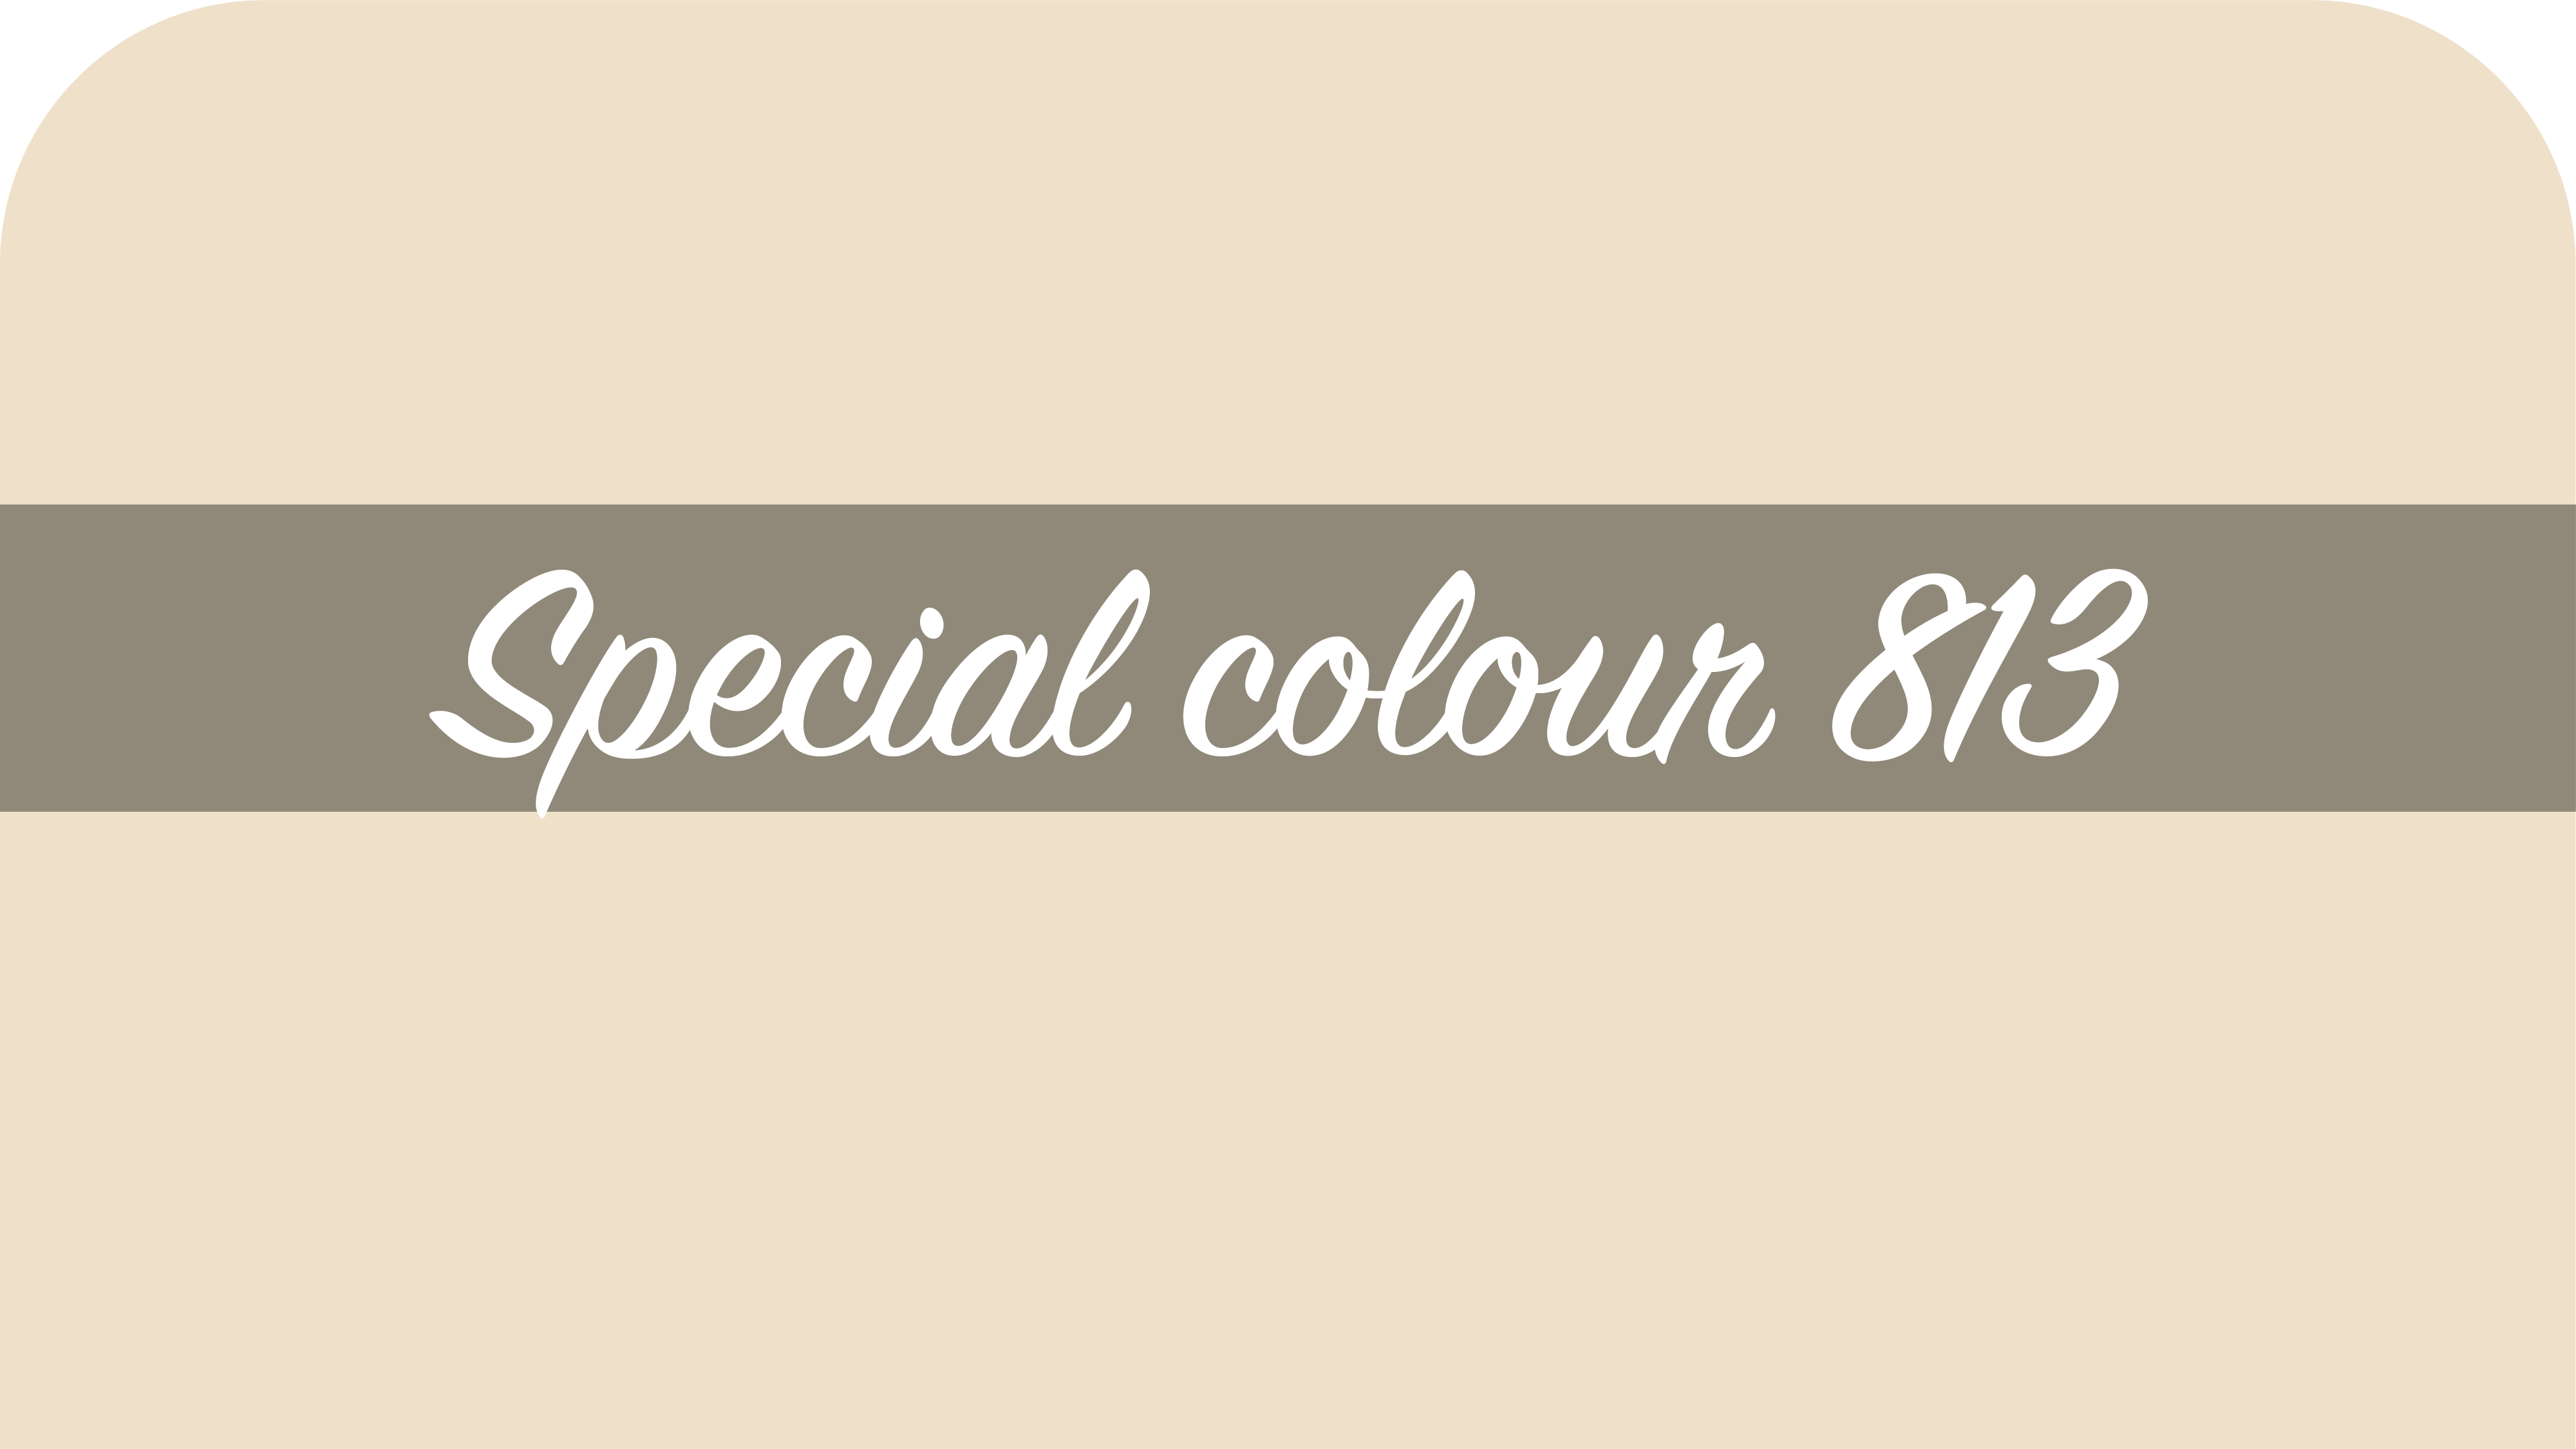 special-colour-813